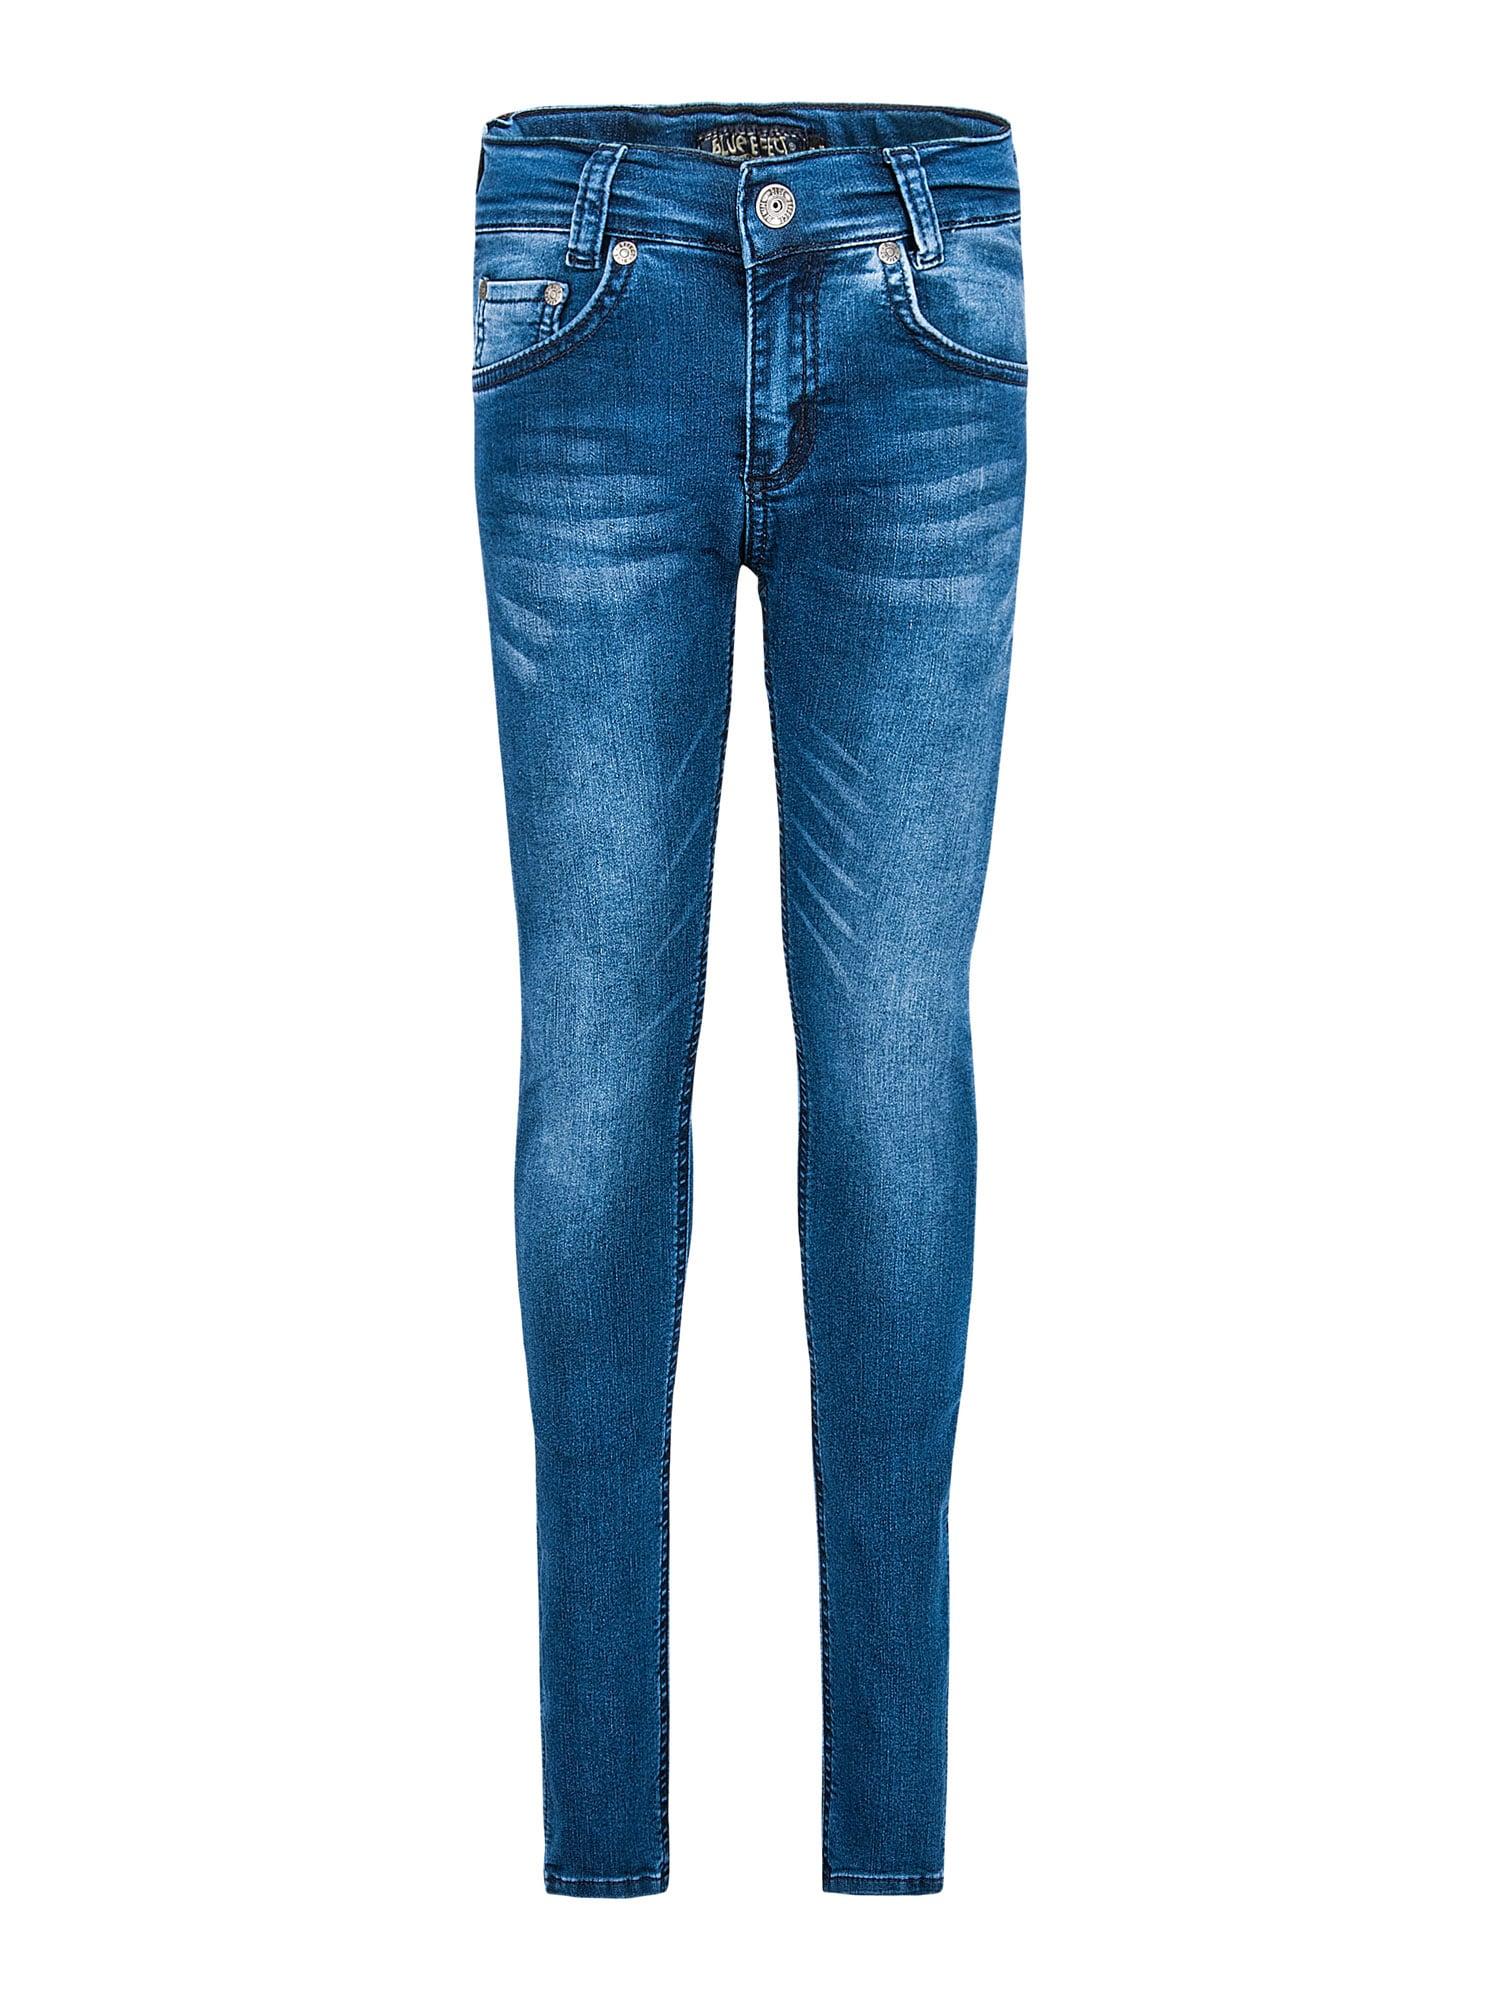 BLUE EFFECT Džinsai tamsiai (džinso) mėlyna